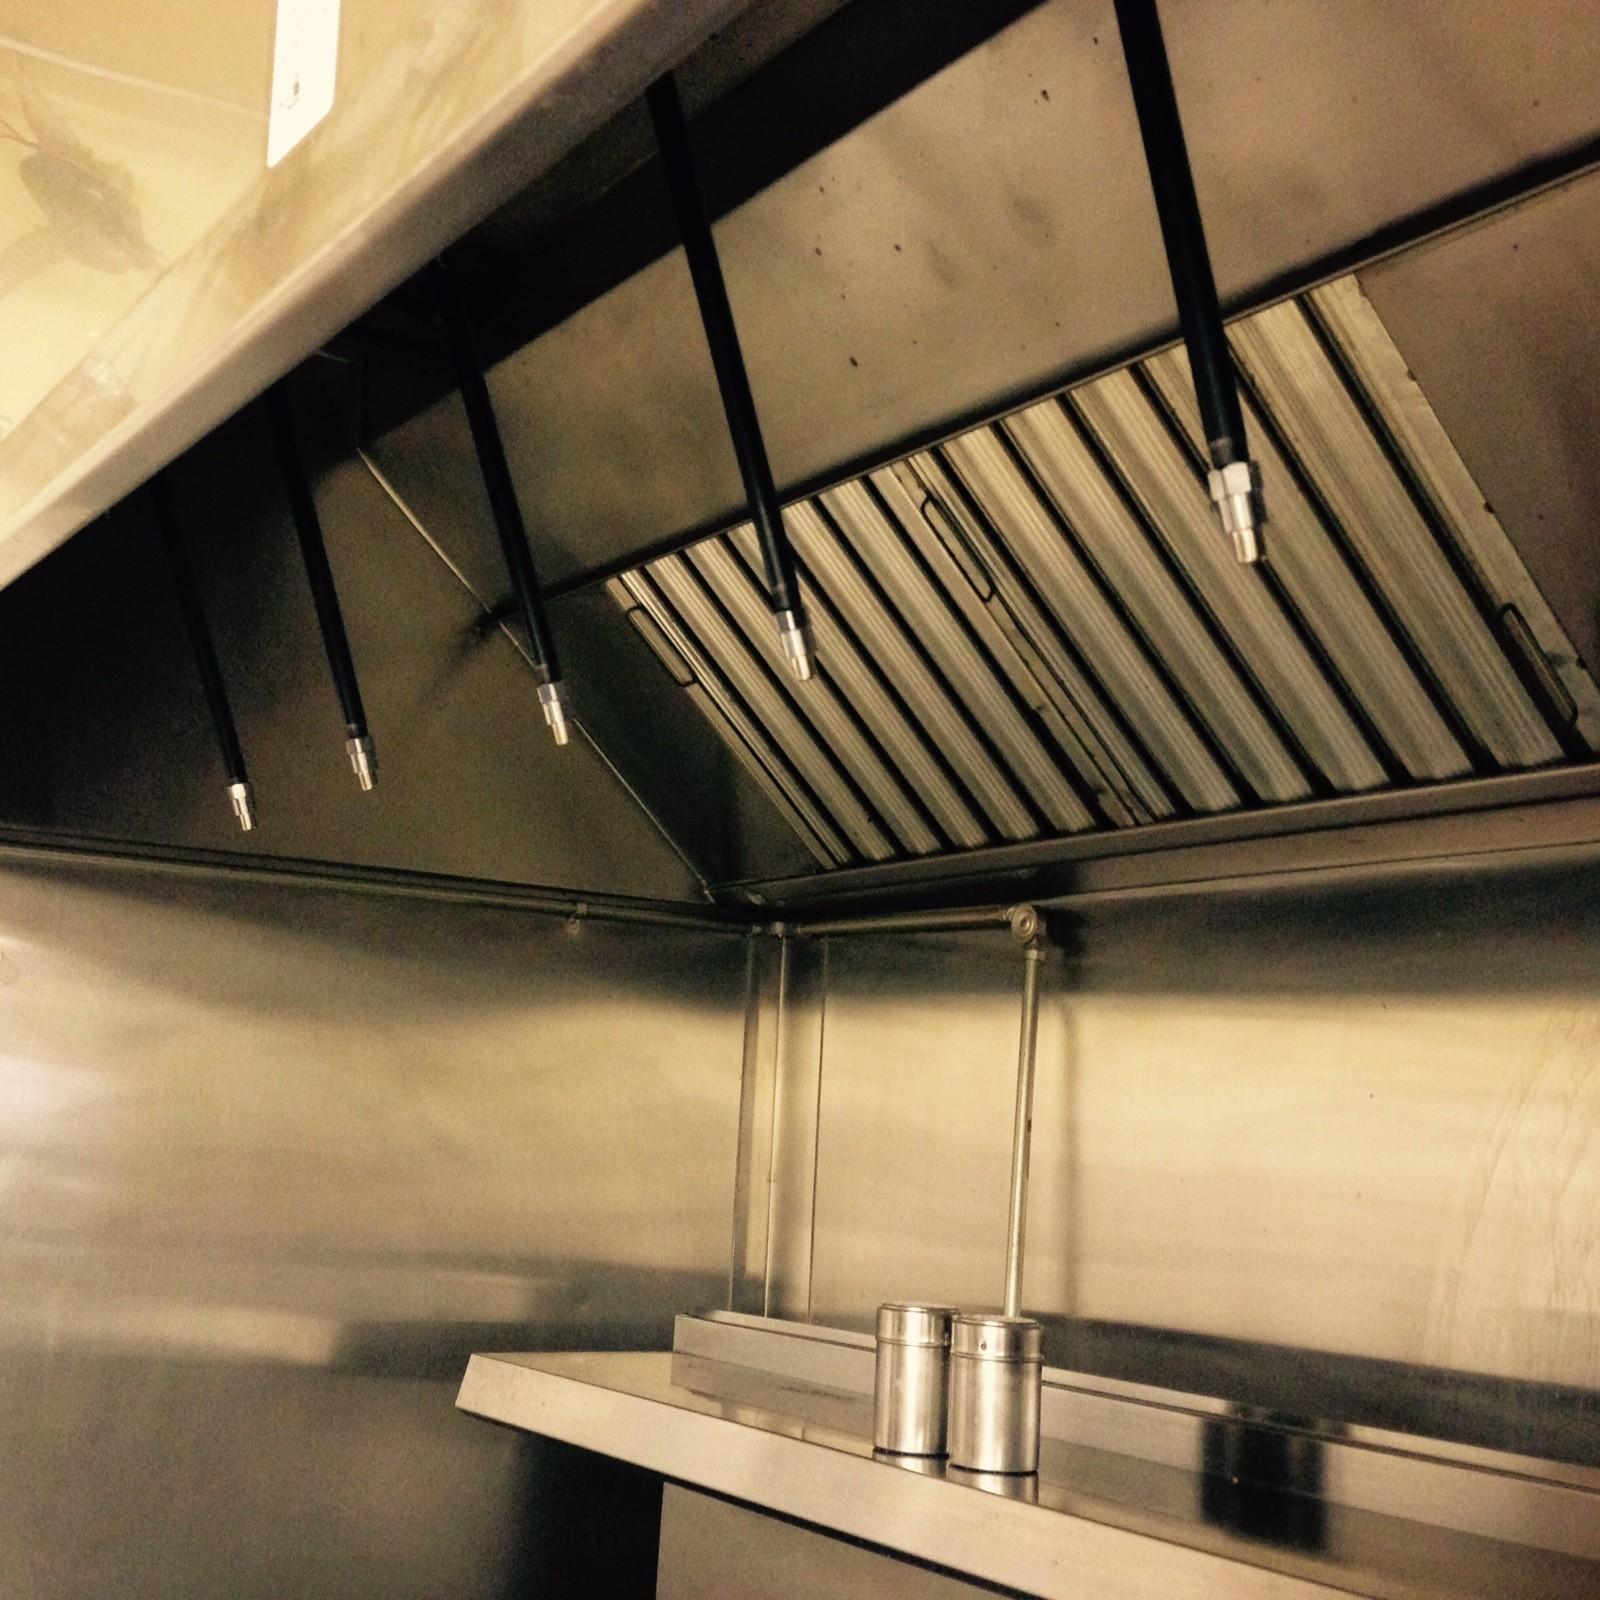 Restaurant Kitchen Without Hood: Fire Suppression System Installation